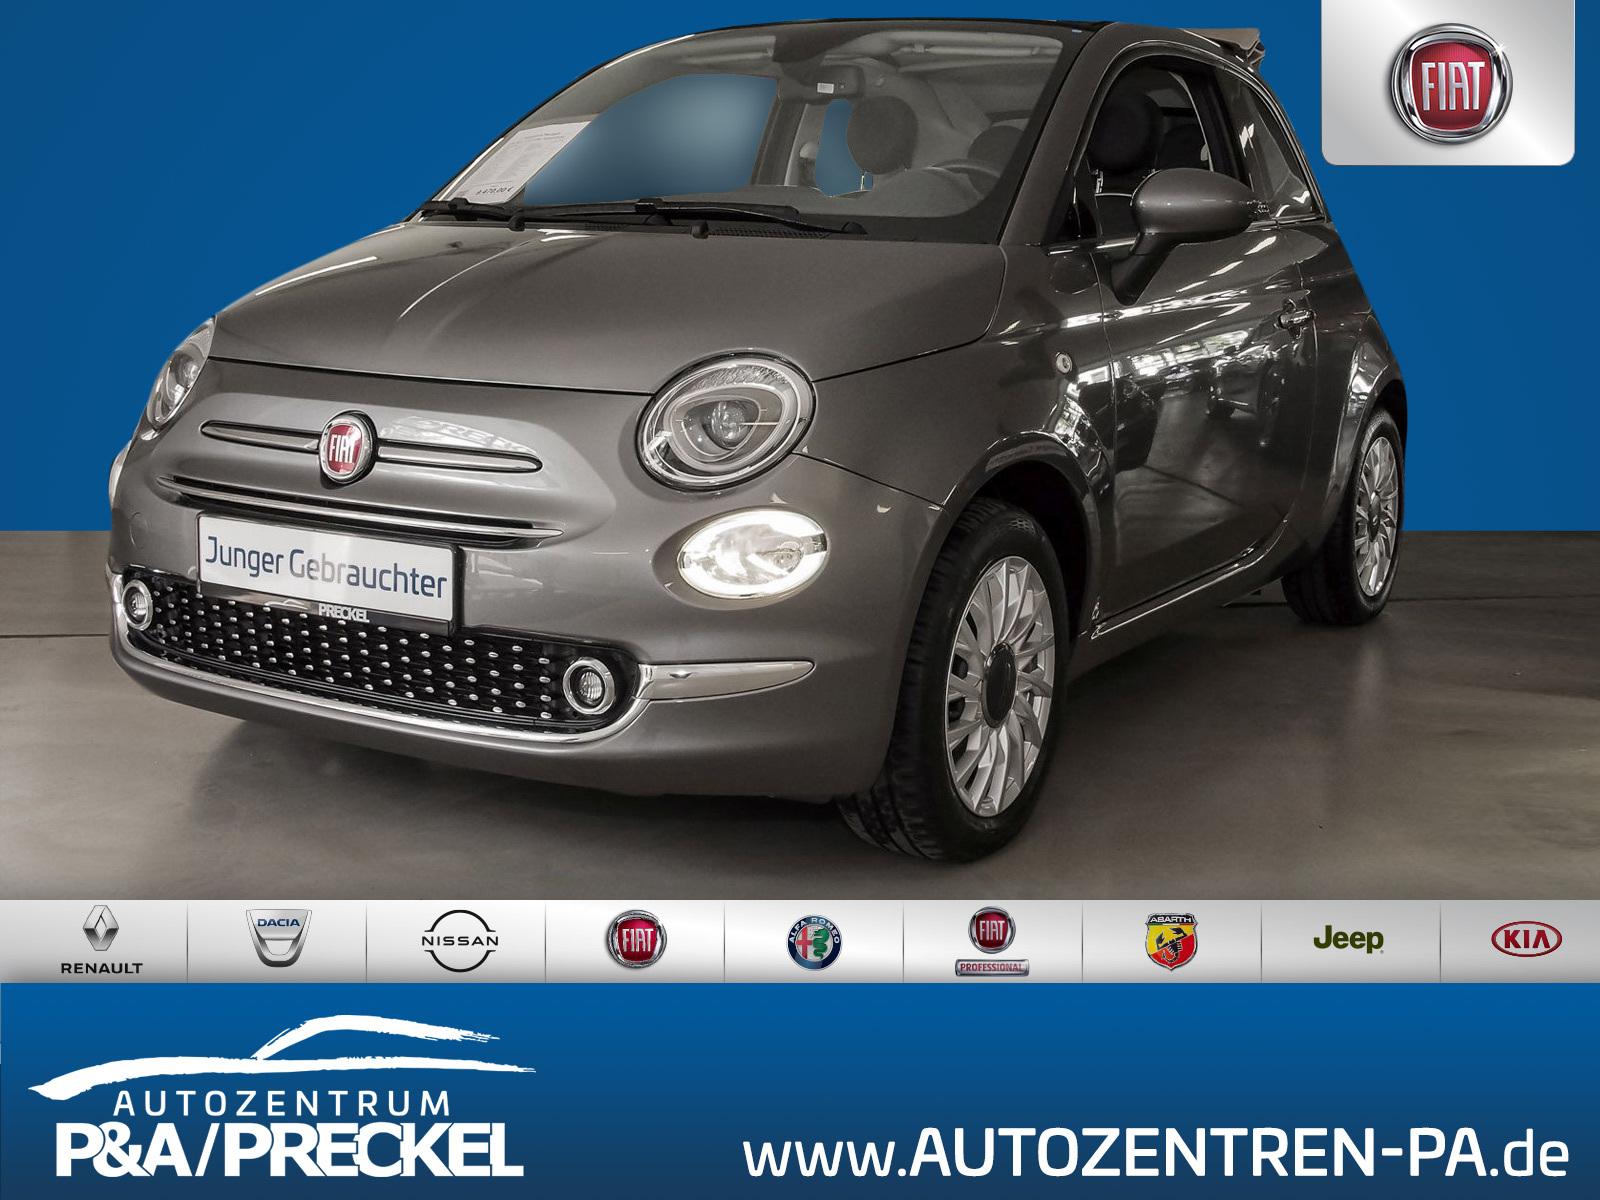 Fiat 500C 1.2 8V Lounge / Klimaautomatik / LM- Felgen / PDC, Jahr 2016, Benzin